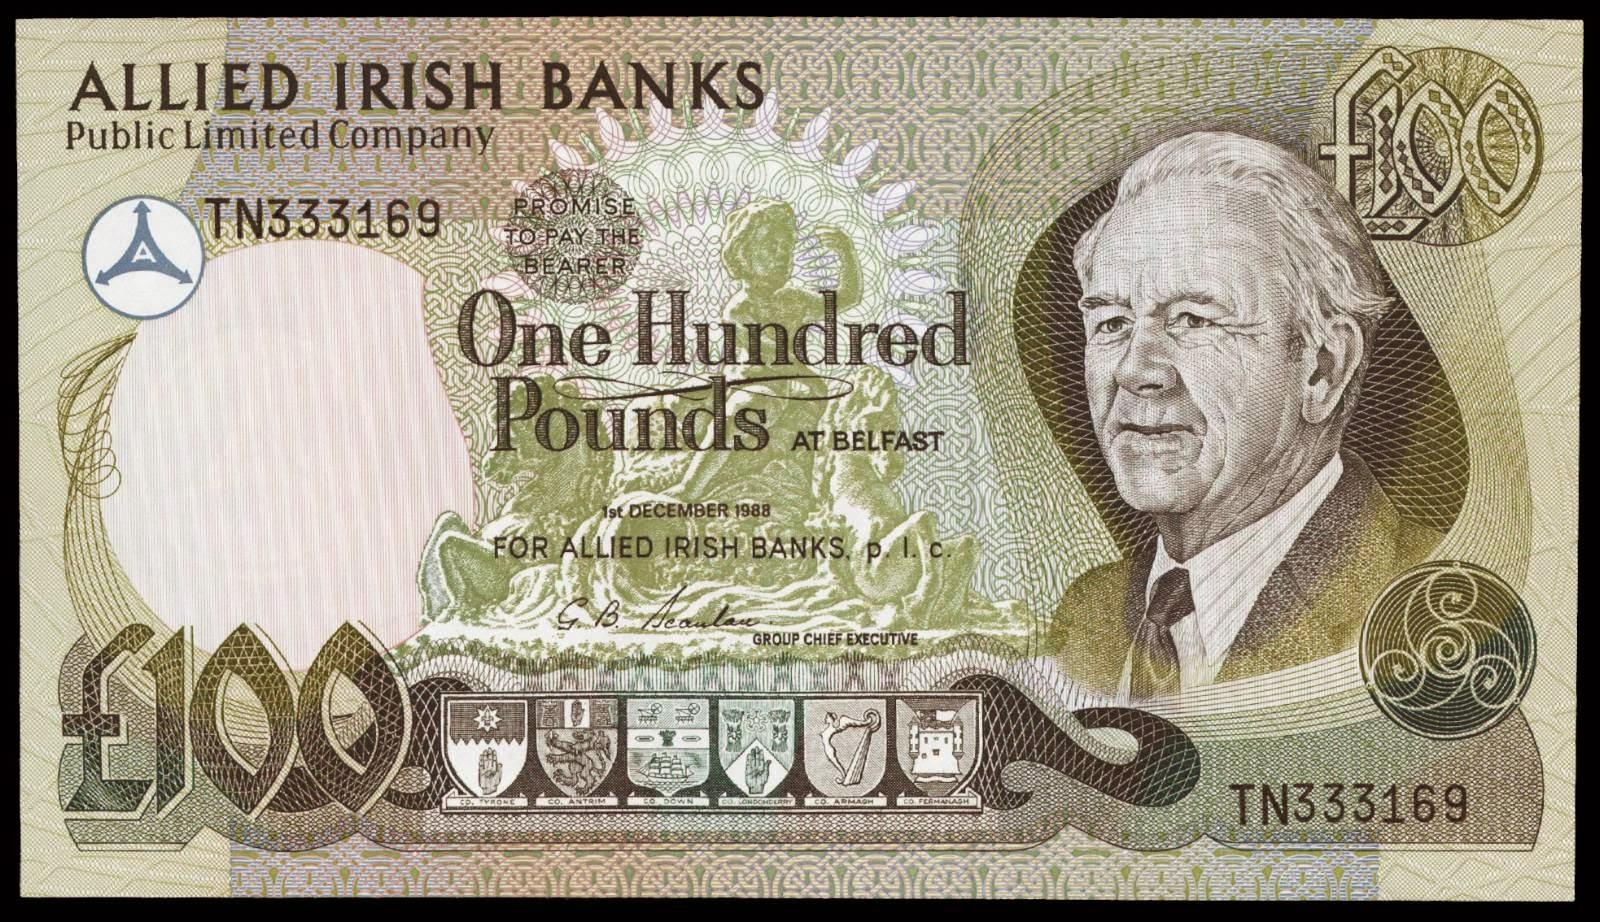 100 pound note 1988 allied irish banksworld banknotes